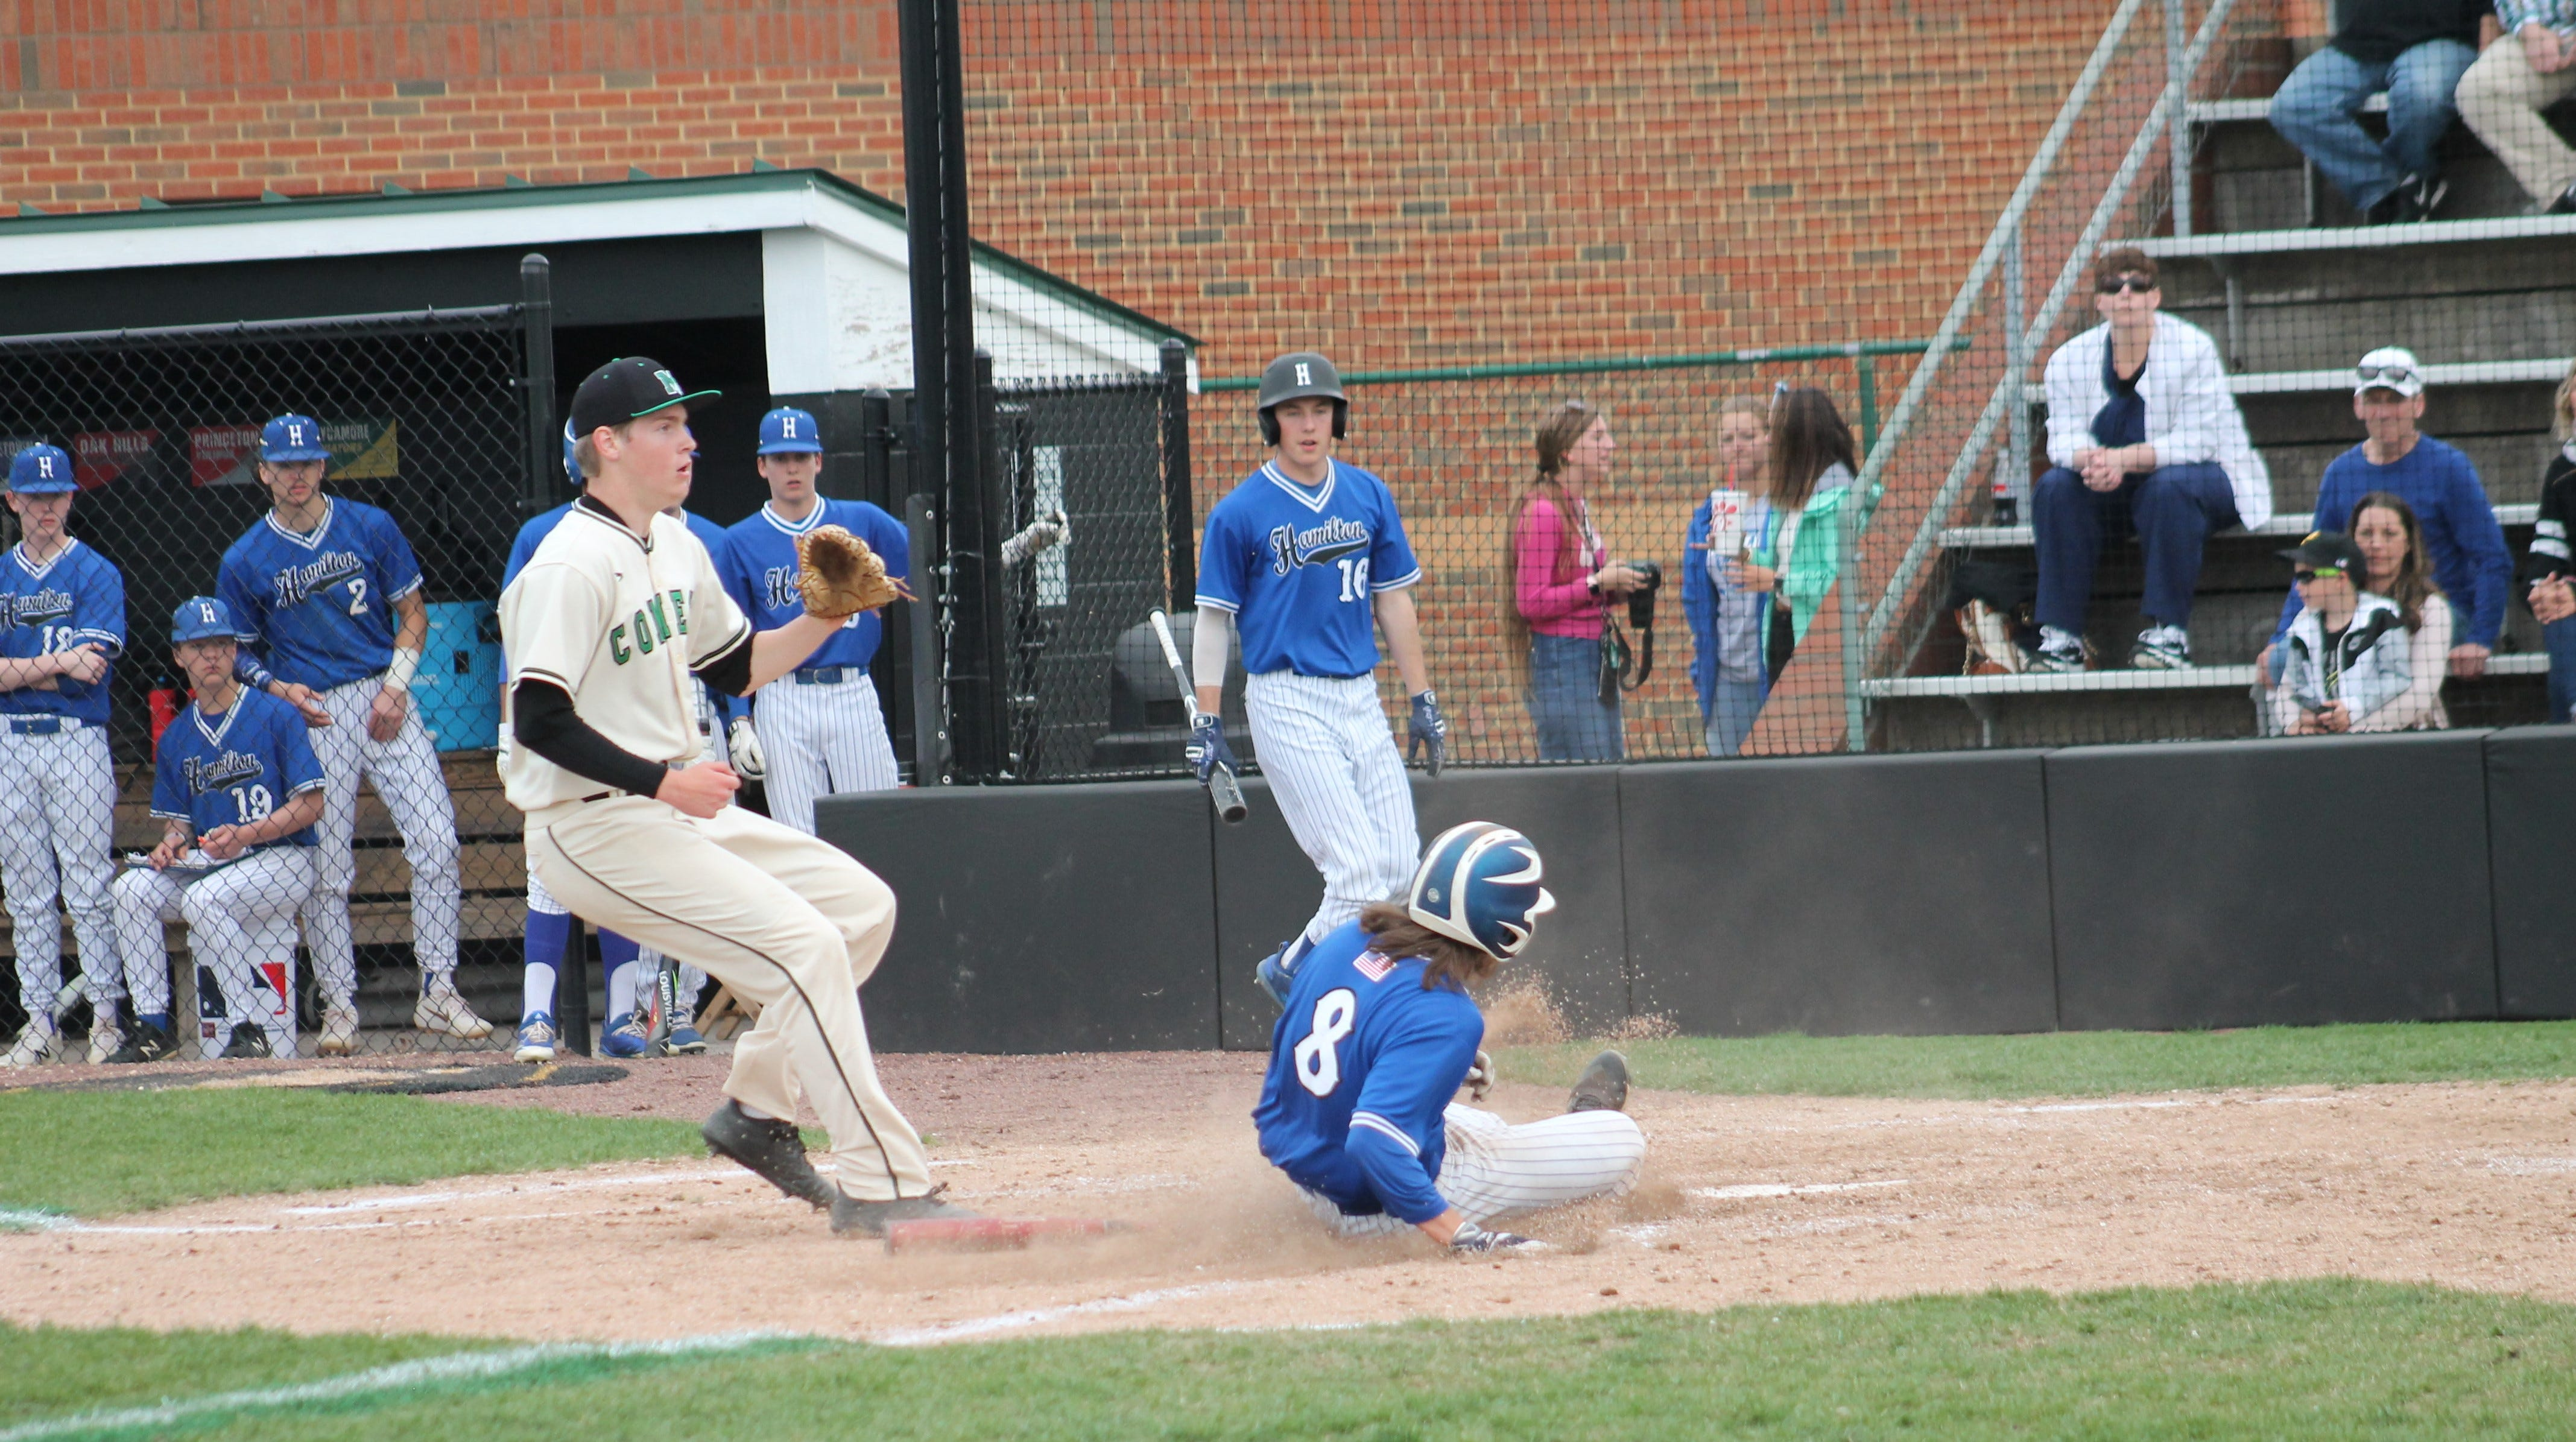 Mason baseball defeats Hamilton 8-4 April 17